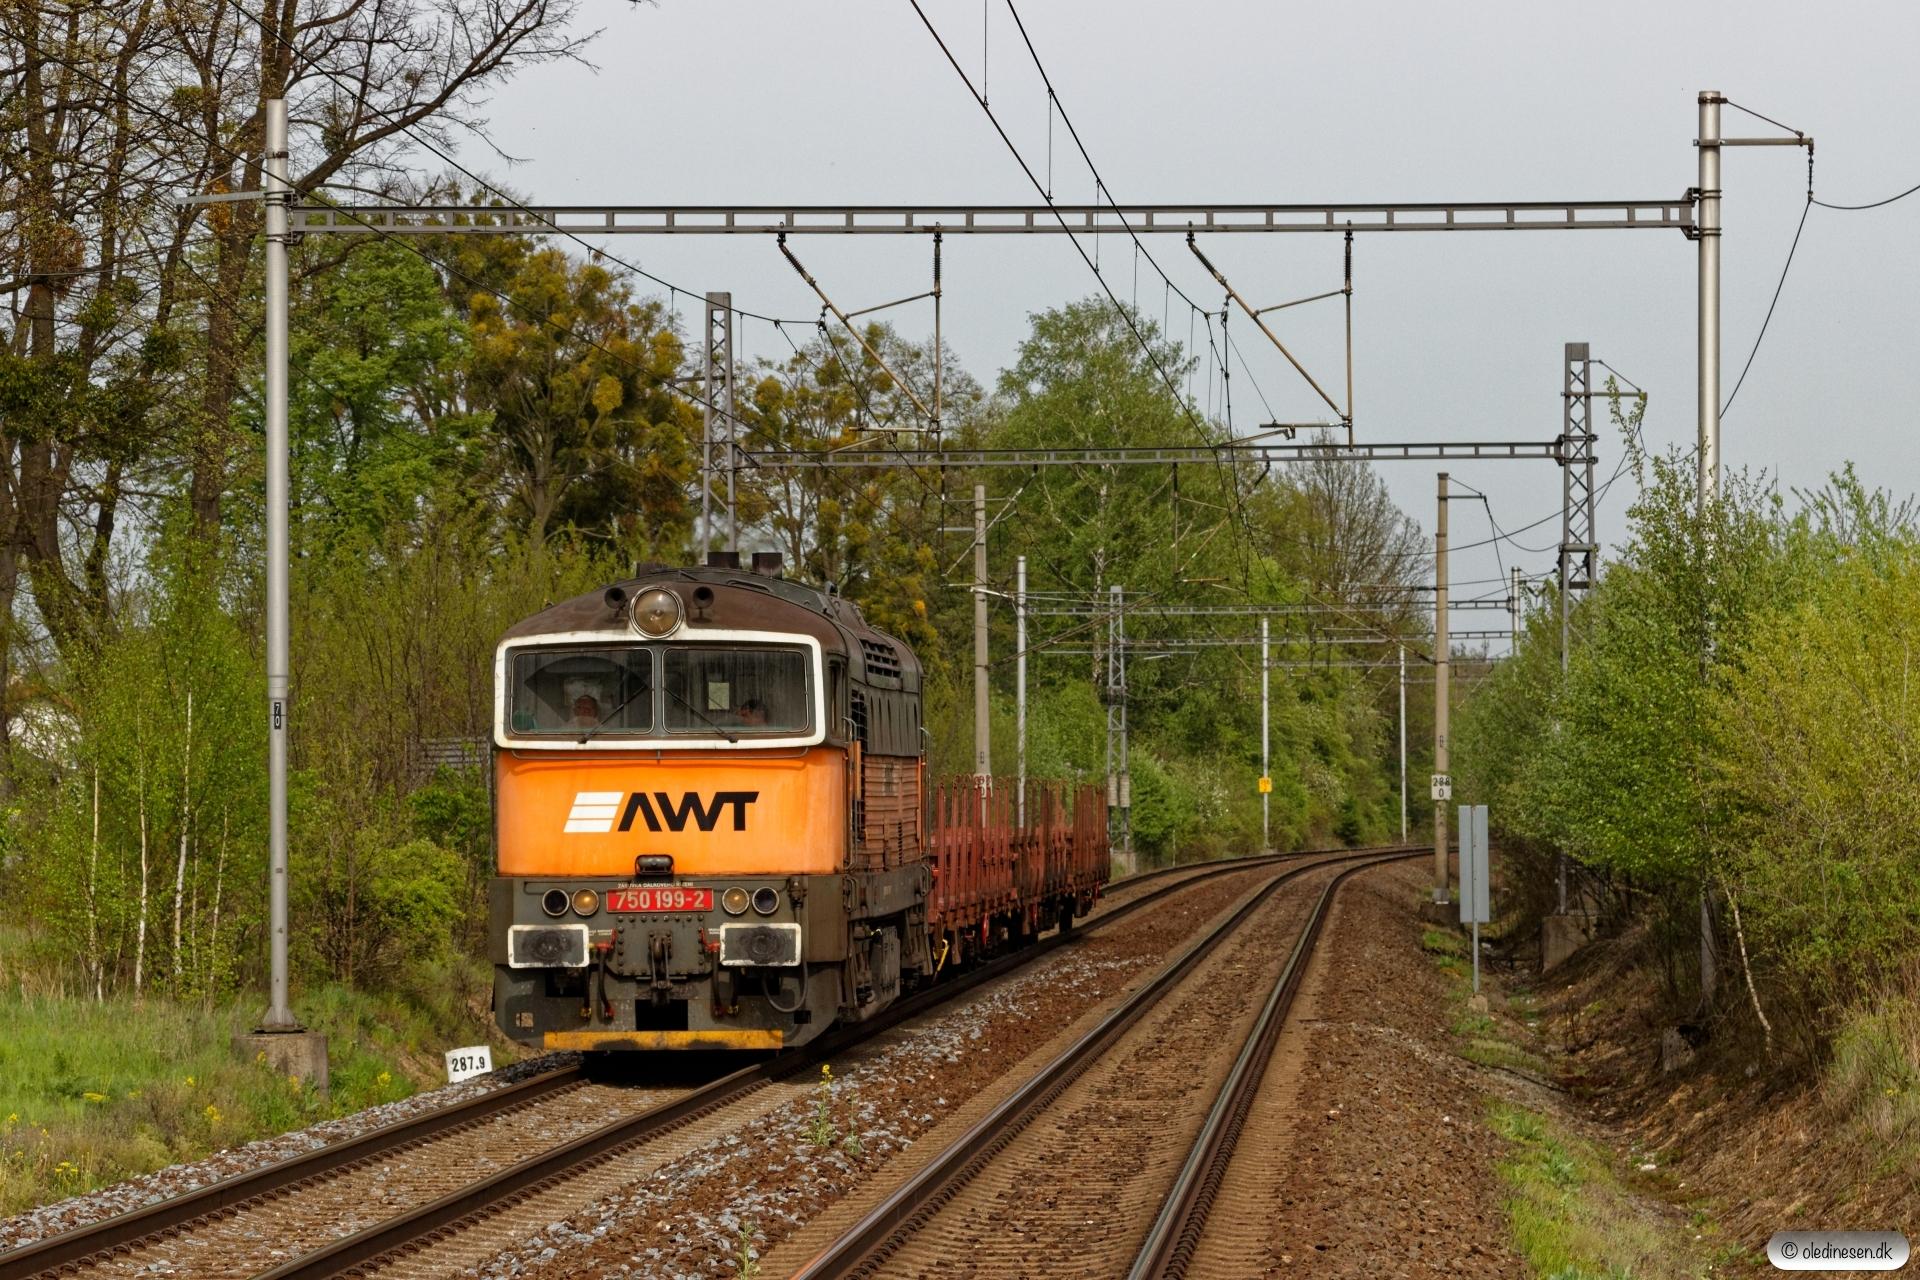 AWT 750 199-2+3 Res. Závada (Tjekkiet) 26.04.2019 kl. 16.07½.